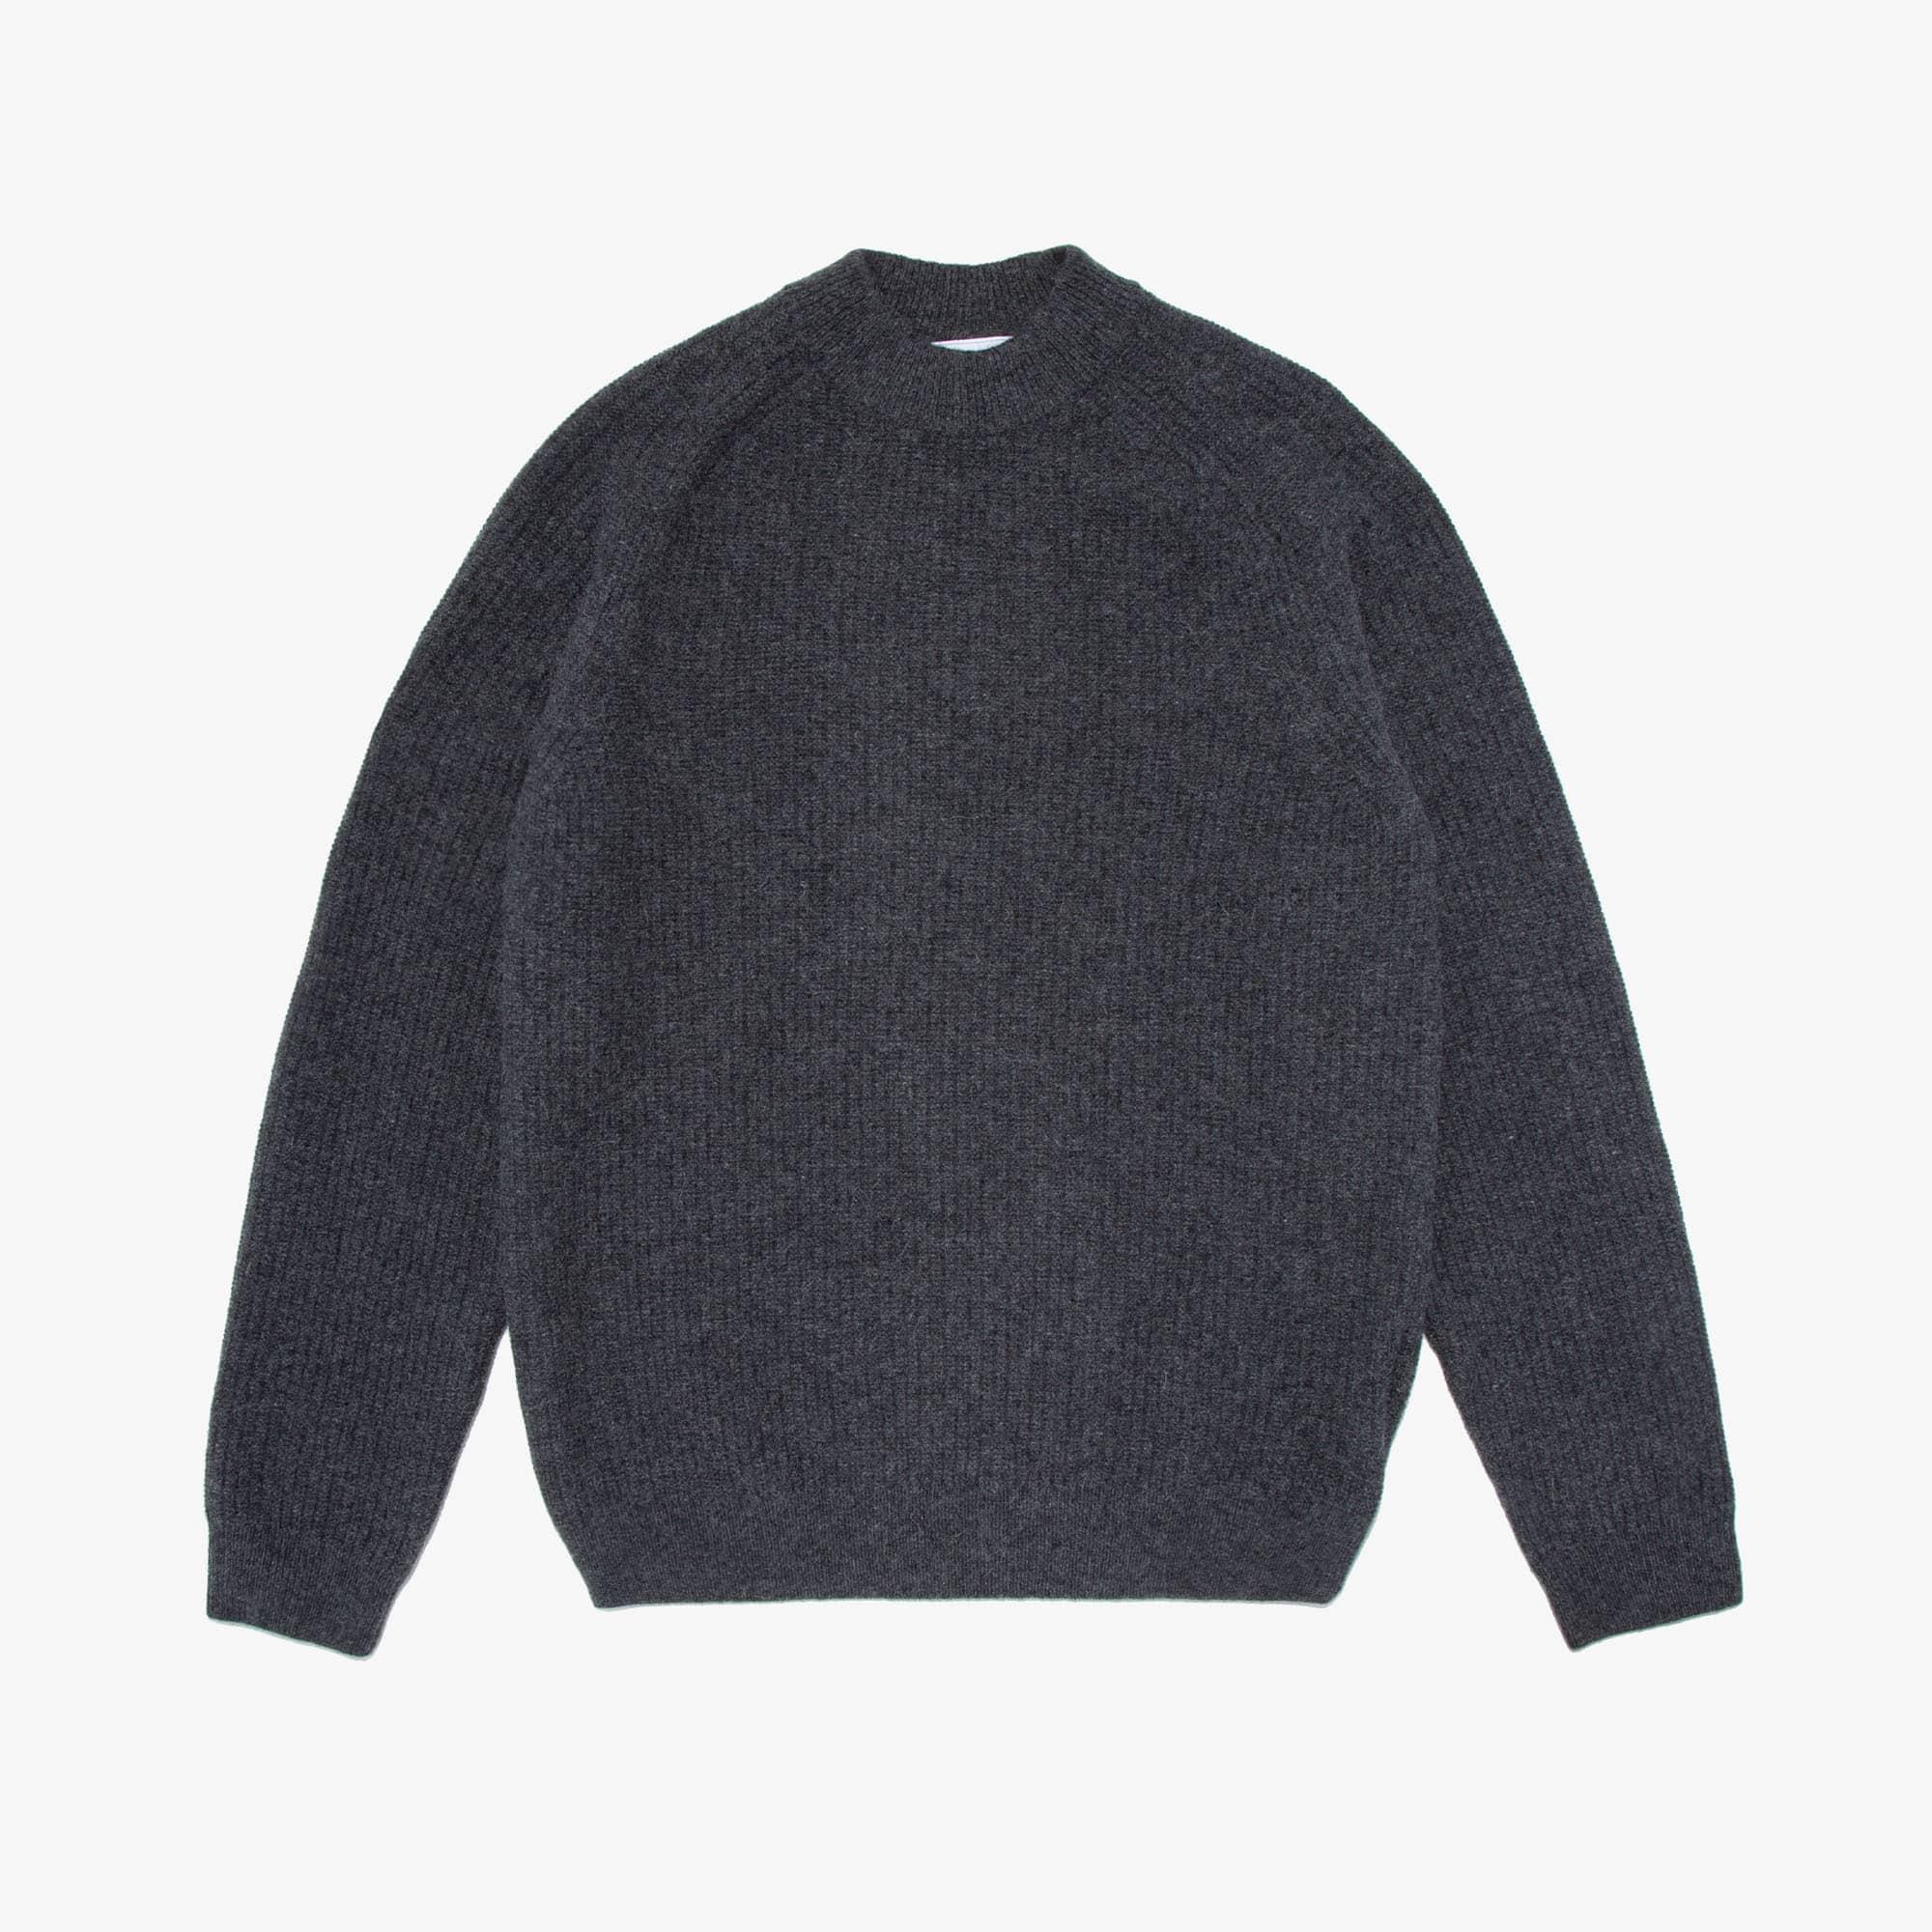 Men's Crewneck Wool And Alpaca Sweater